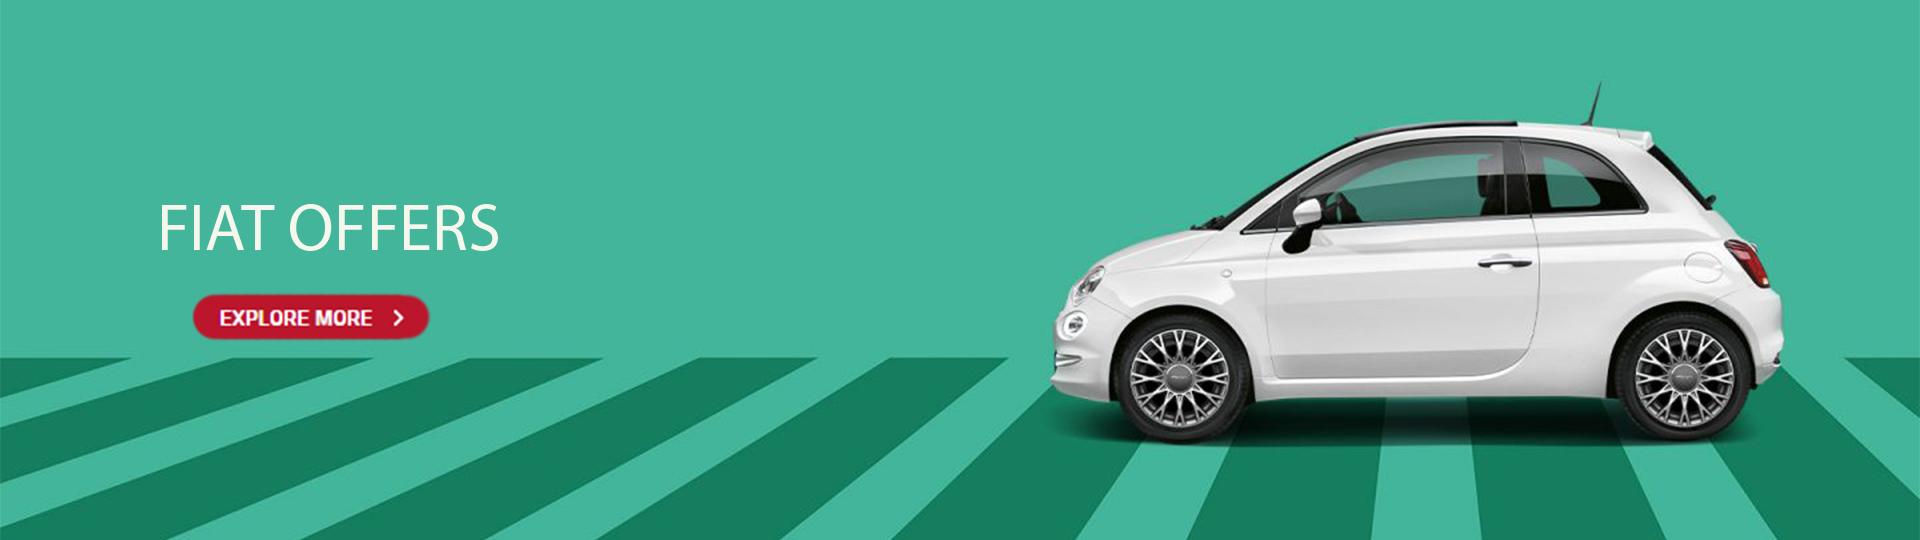 Cricks Auto Fiat April Offers